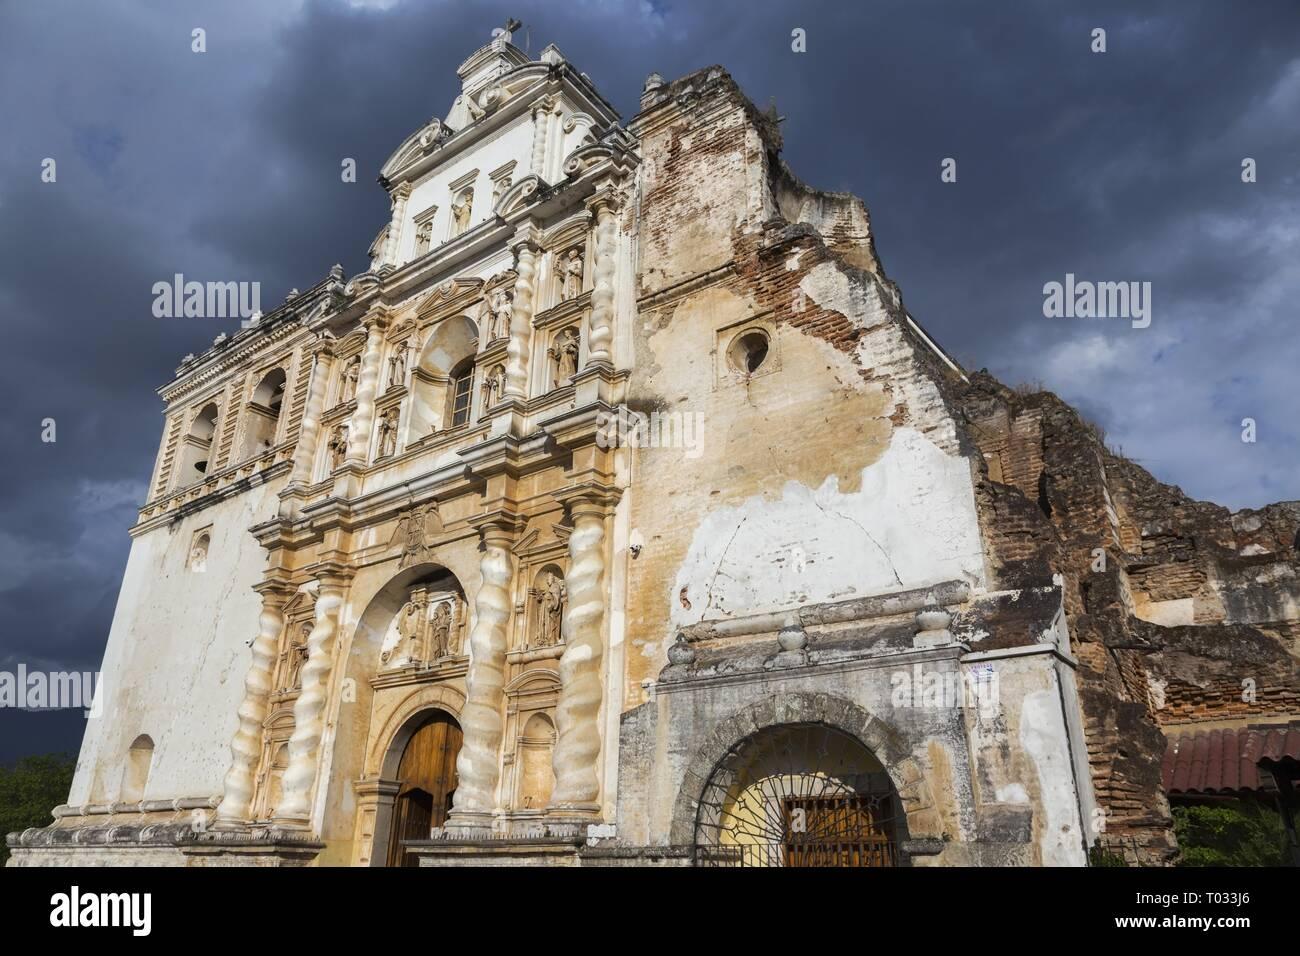 iglesia-san-francisco-el-grande-spanish-